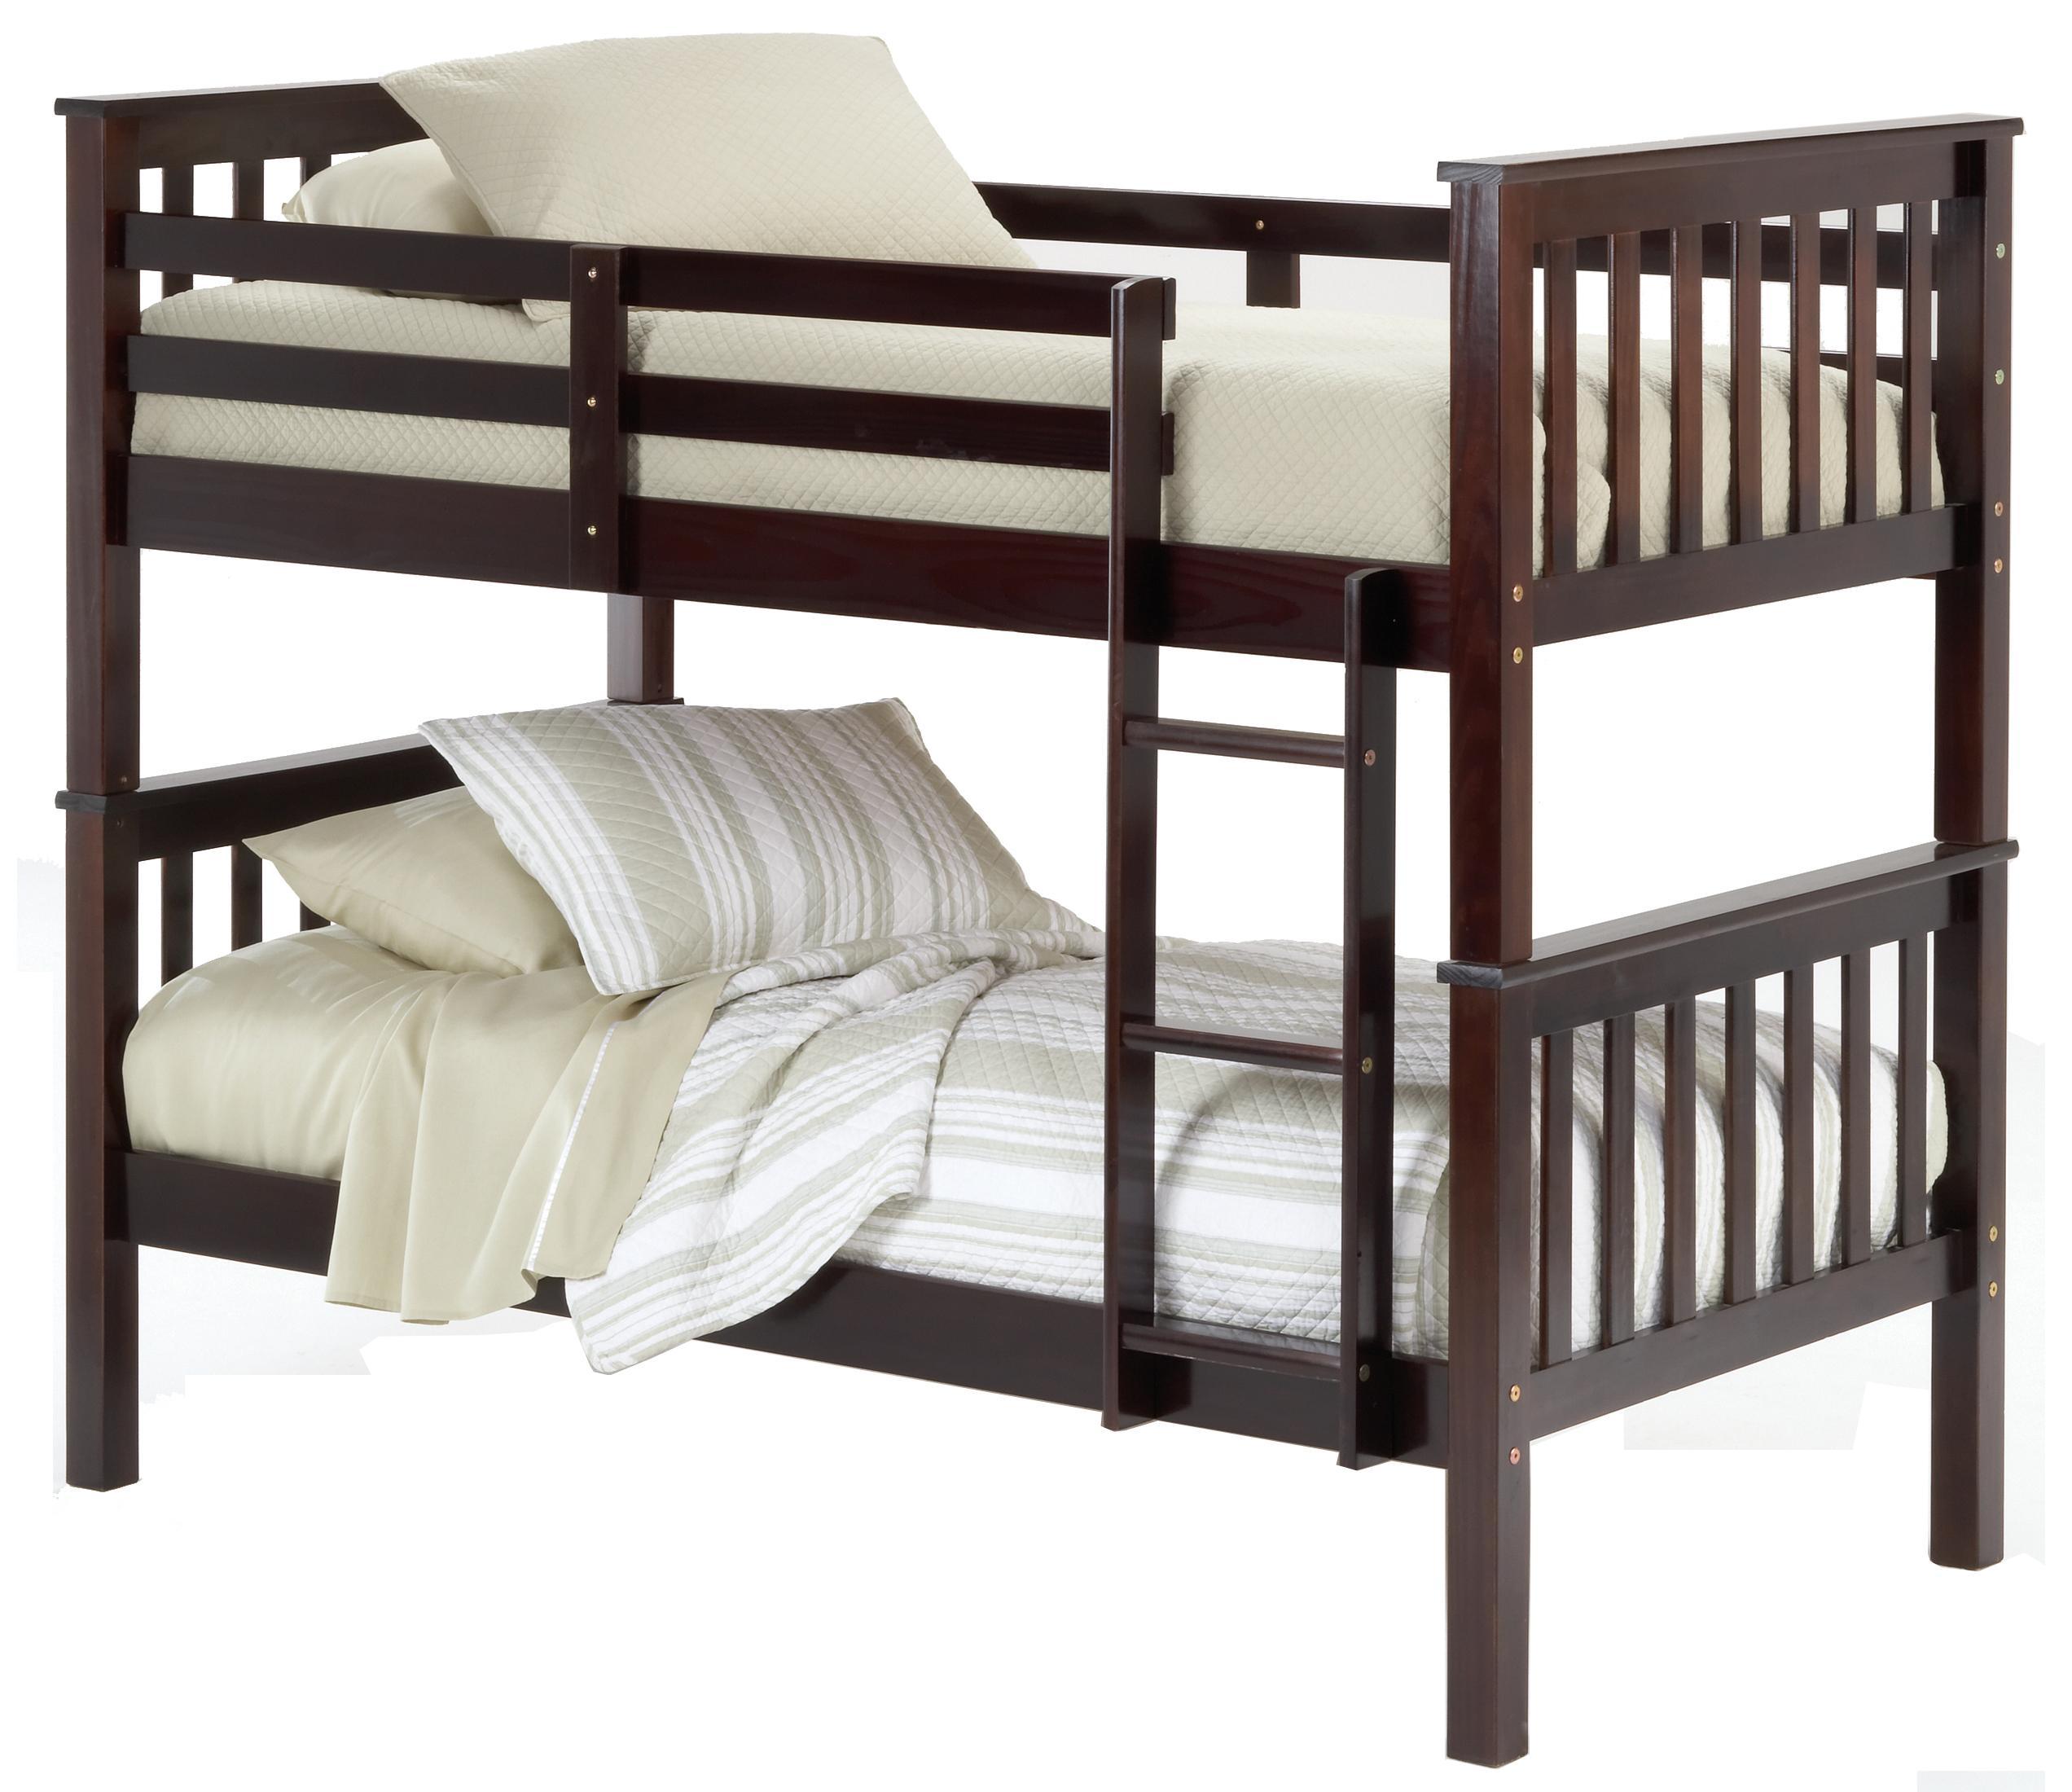 Bernards Sadler Twin Bunk Bed Requires Bunkie Boards